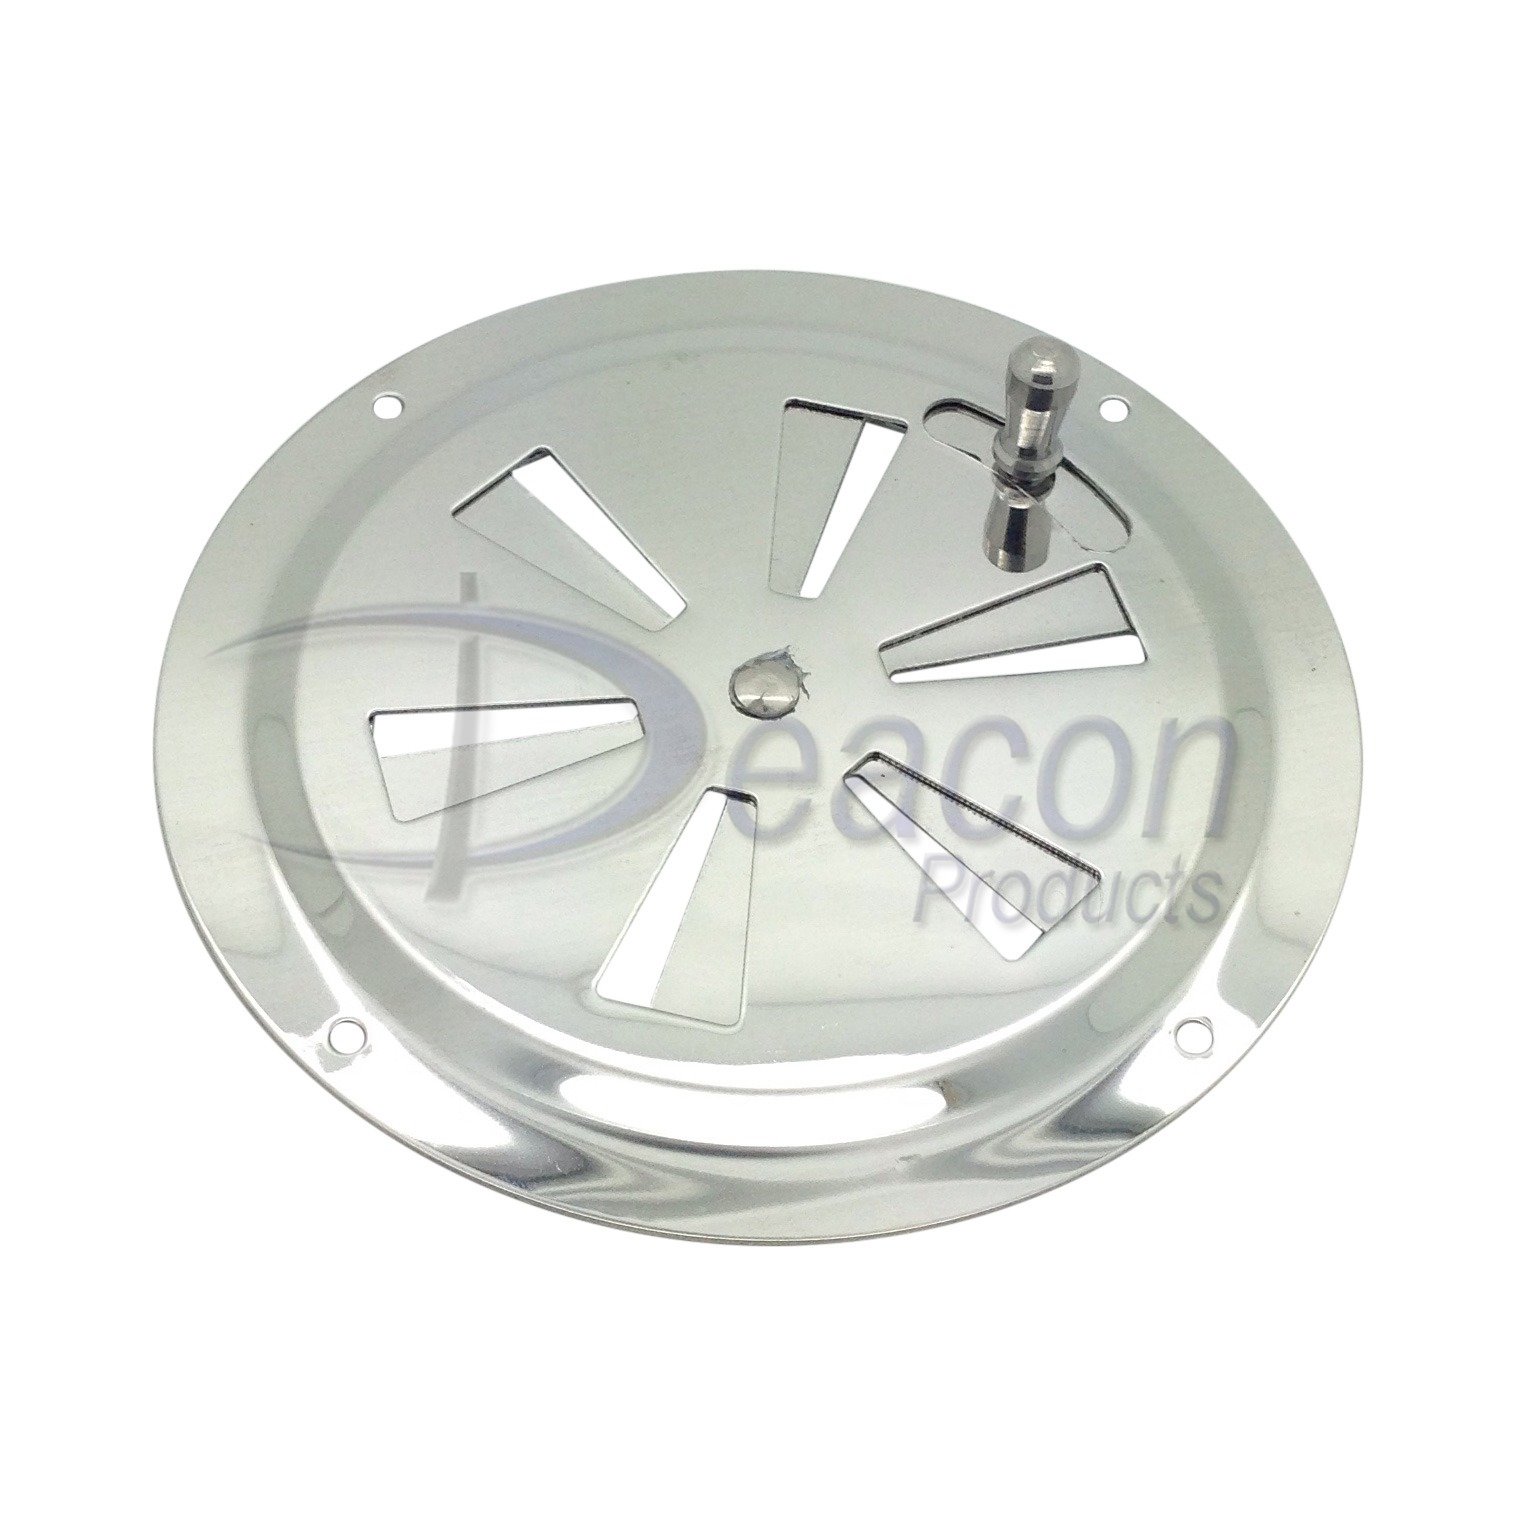 stainless-steel-lockable-round-vent